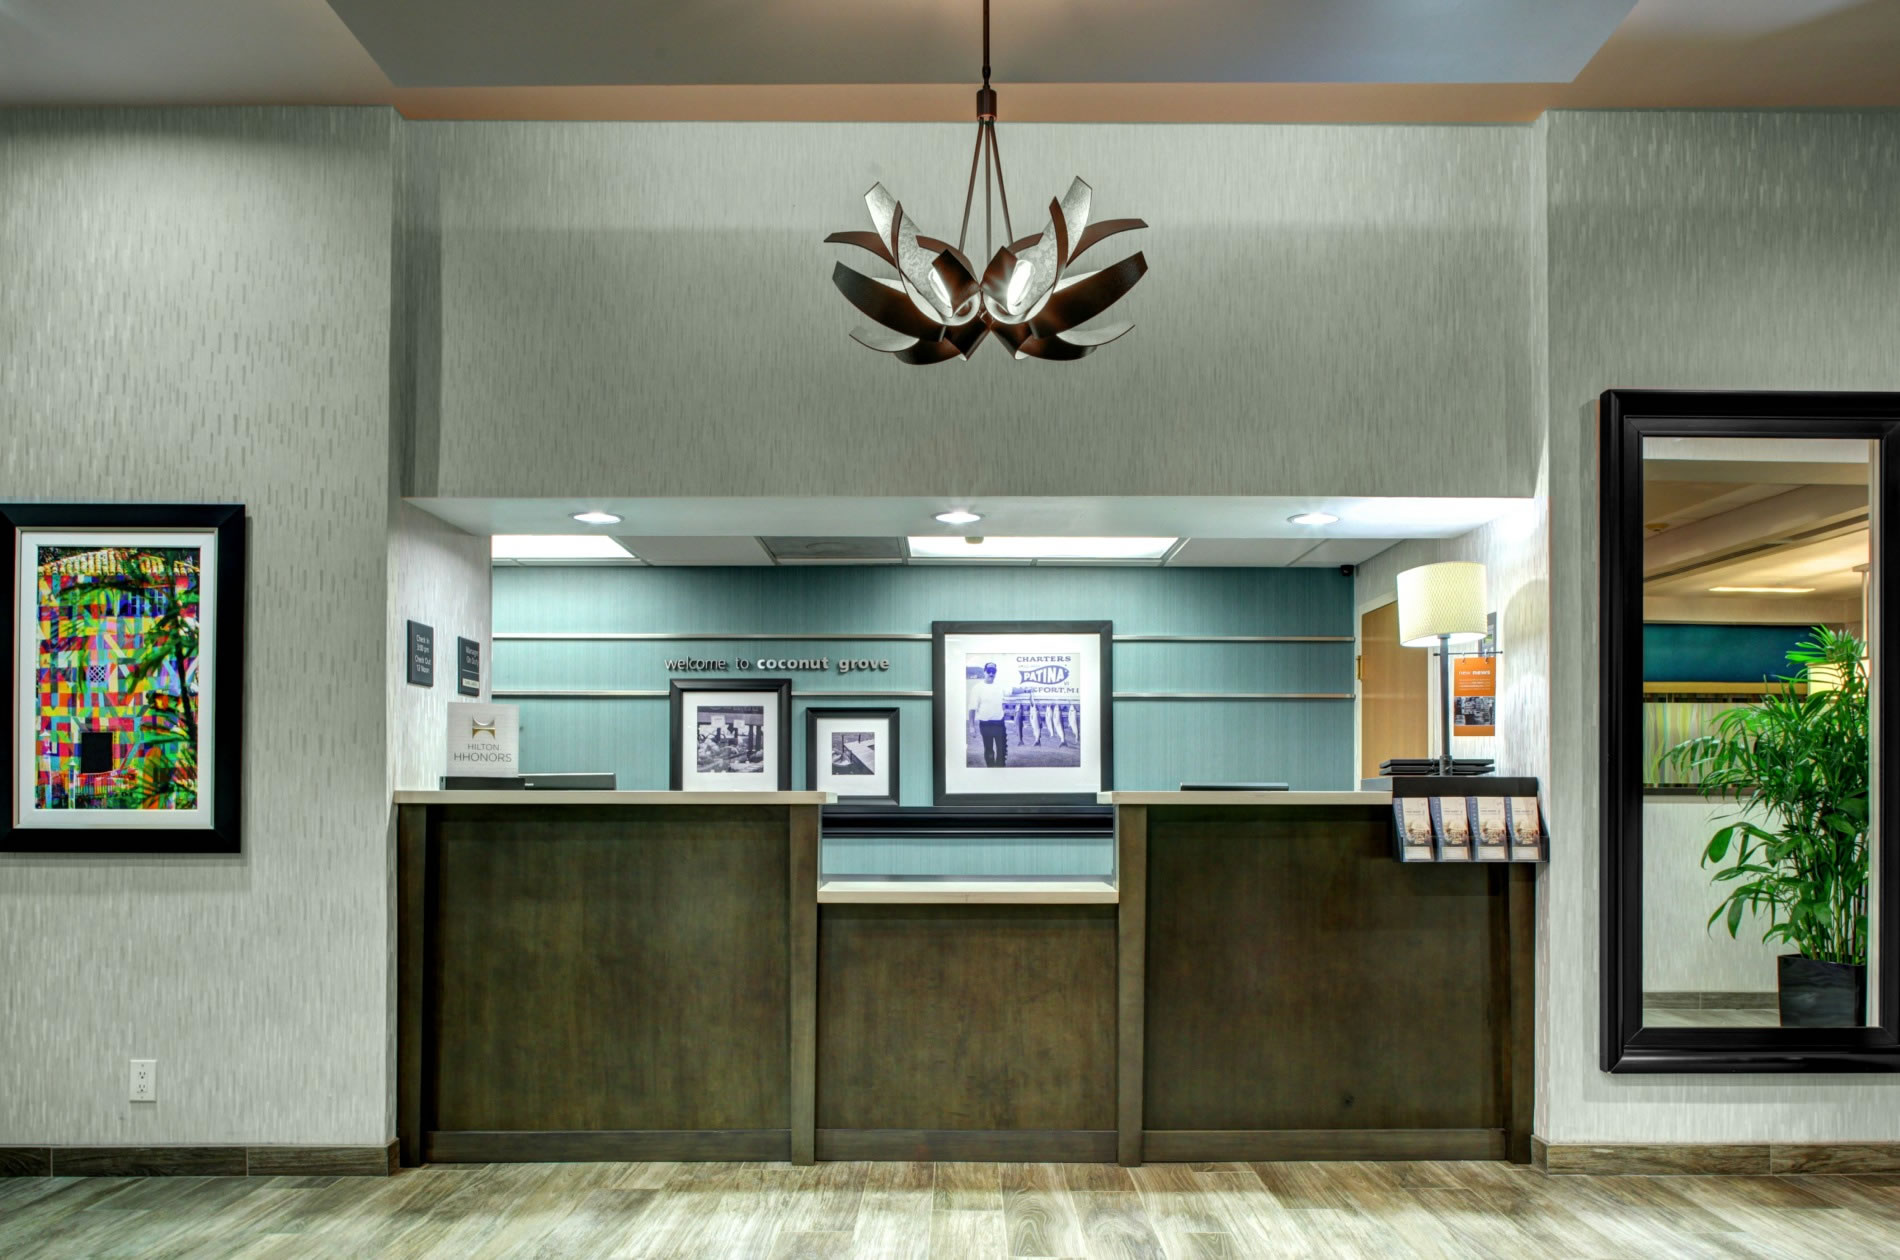 Hampton Inn by Hilton Coconut Grove Coral Gables Miami image 1